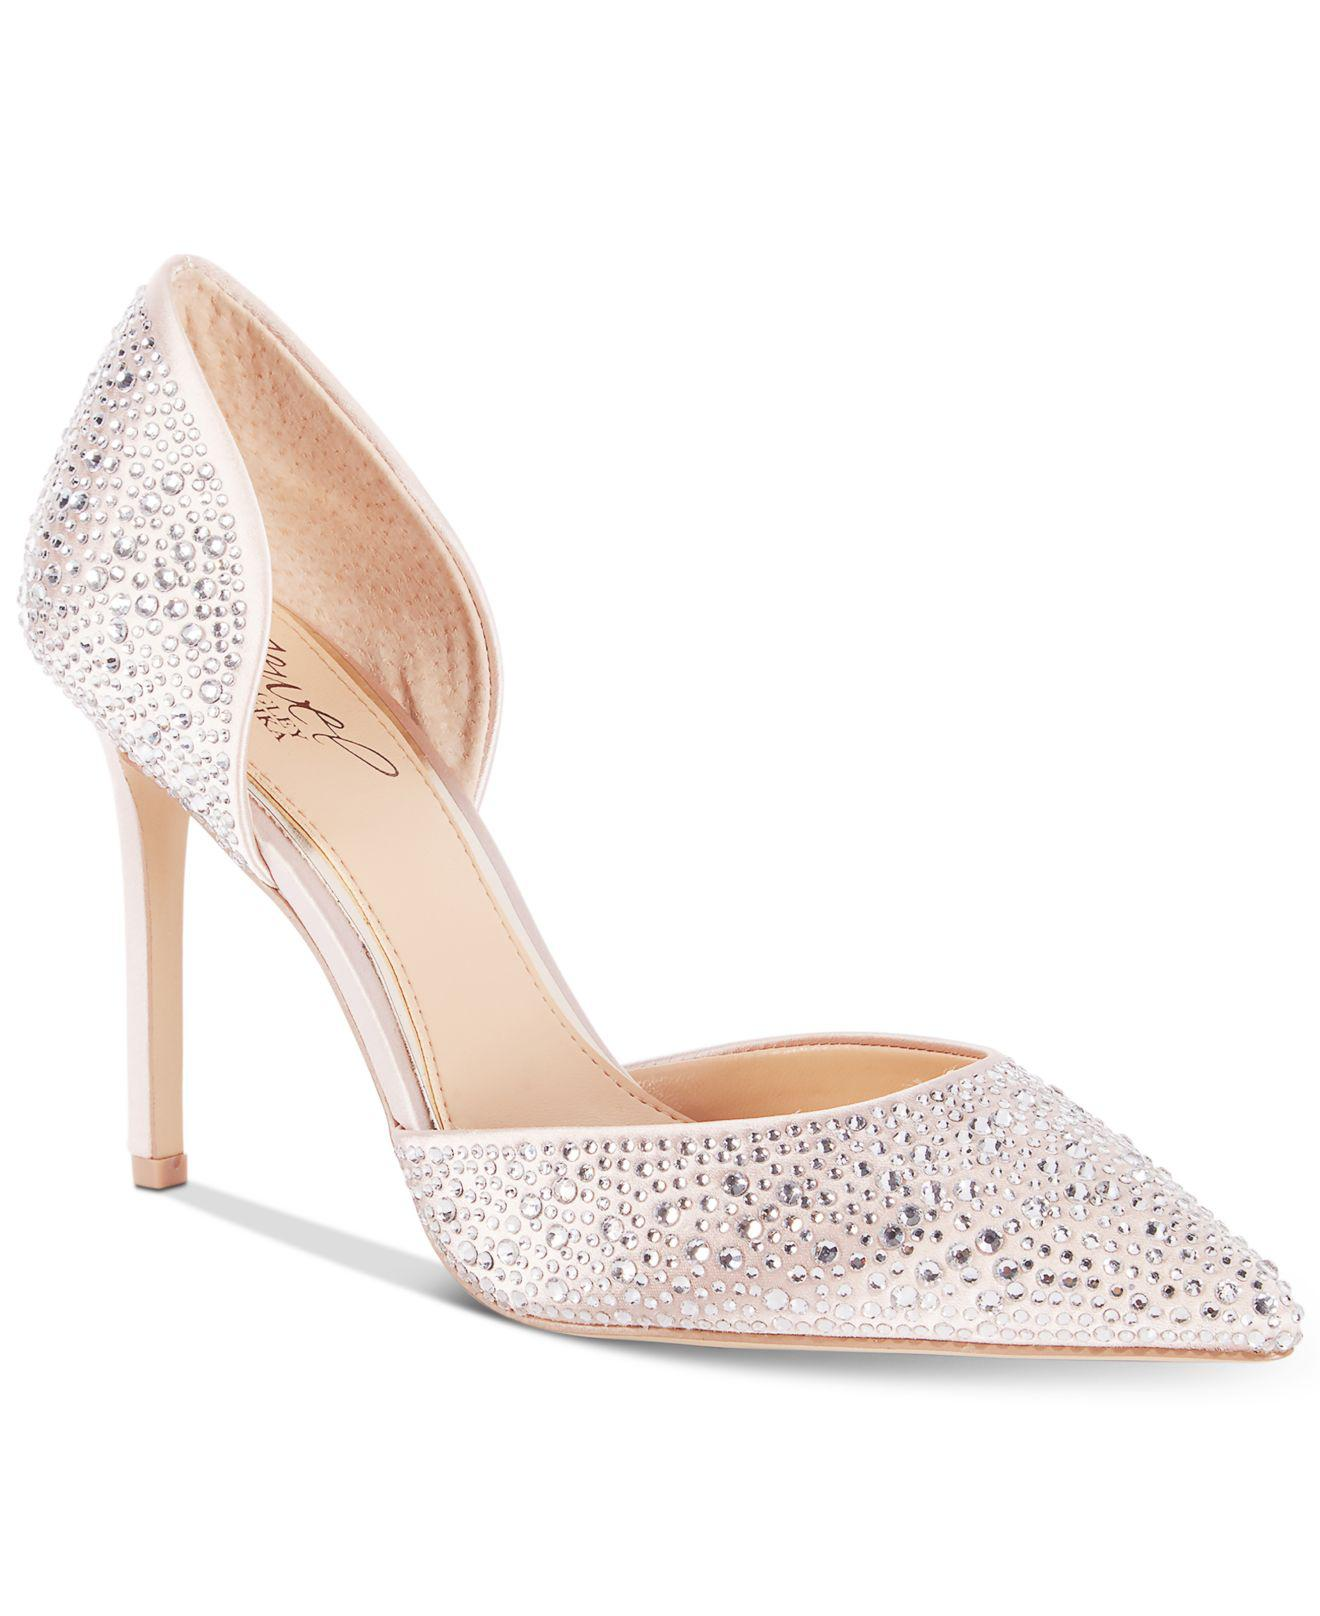 Badgley Mischka Alexandra Embelished Pointed-Toe Evening Pumps Women's Shoes 8NYV48KCU